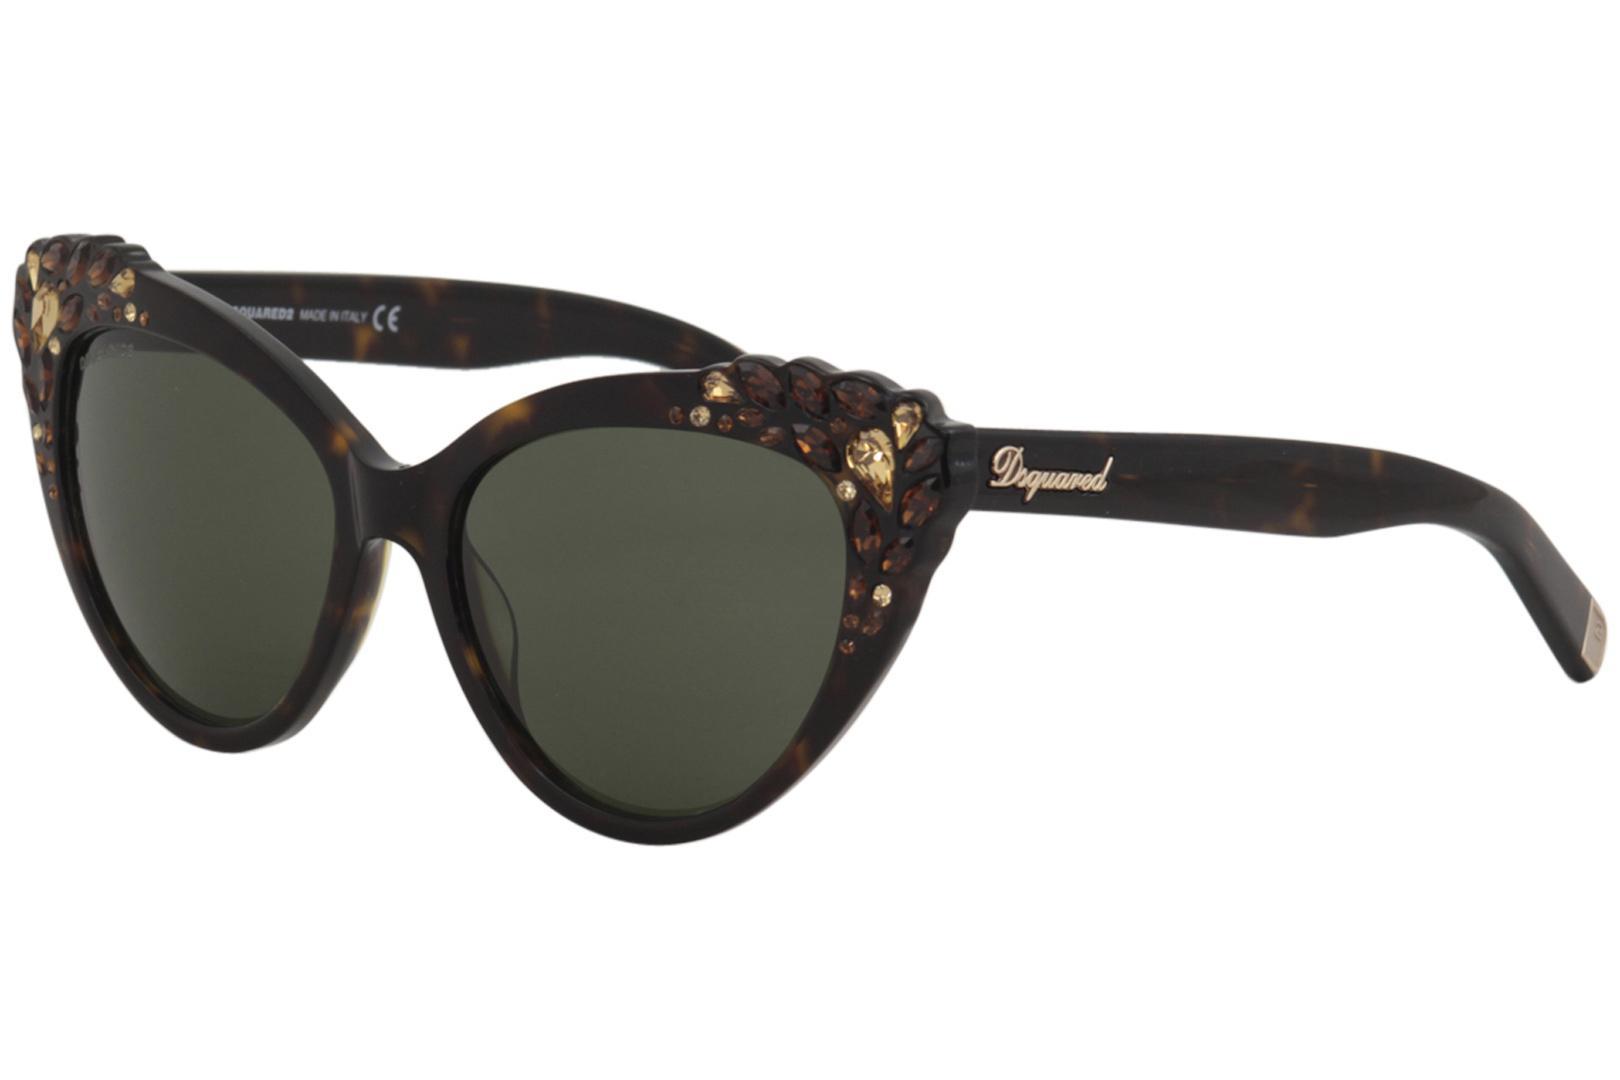 5058fe596f2 Dsquared2 Women s Elizabeth DQ168 DQ 168 Cat Eye Fashion Sunglasses